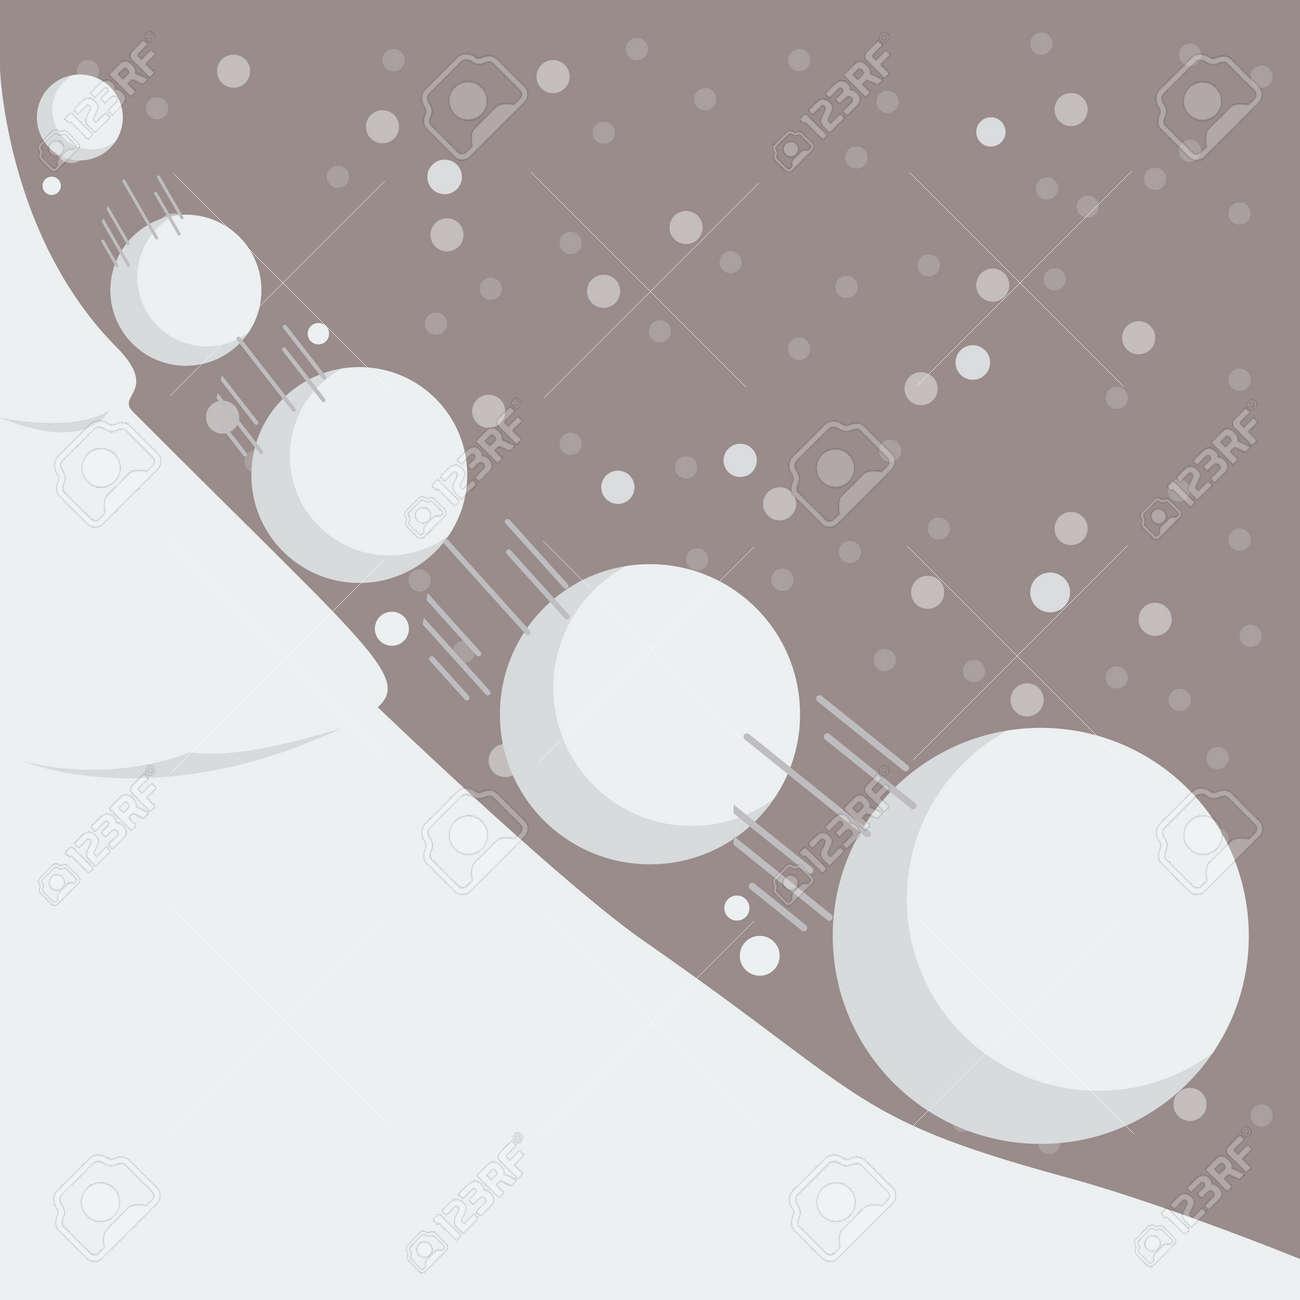 Snowball effect. Vector Illustration - 59191474